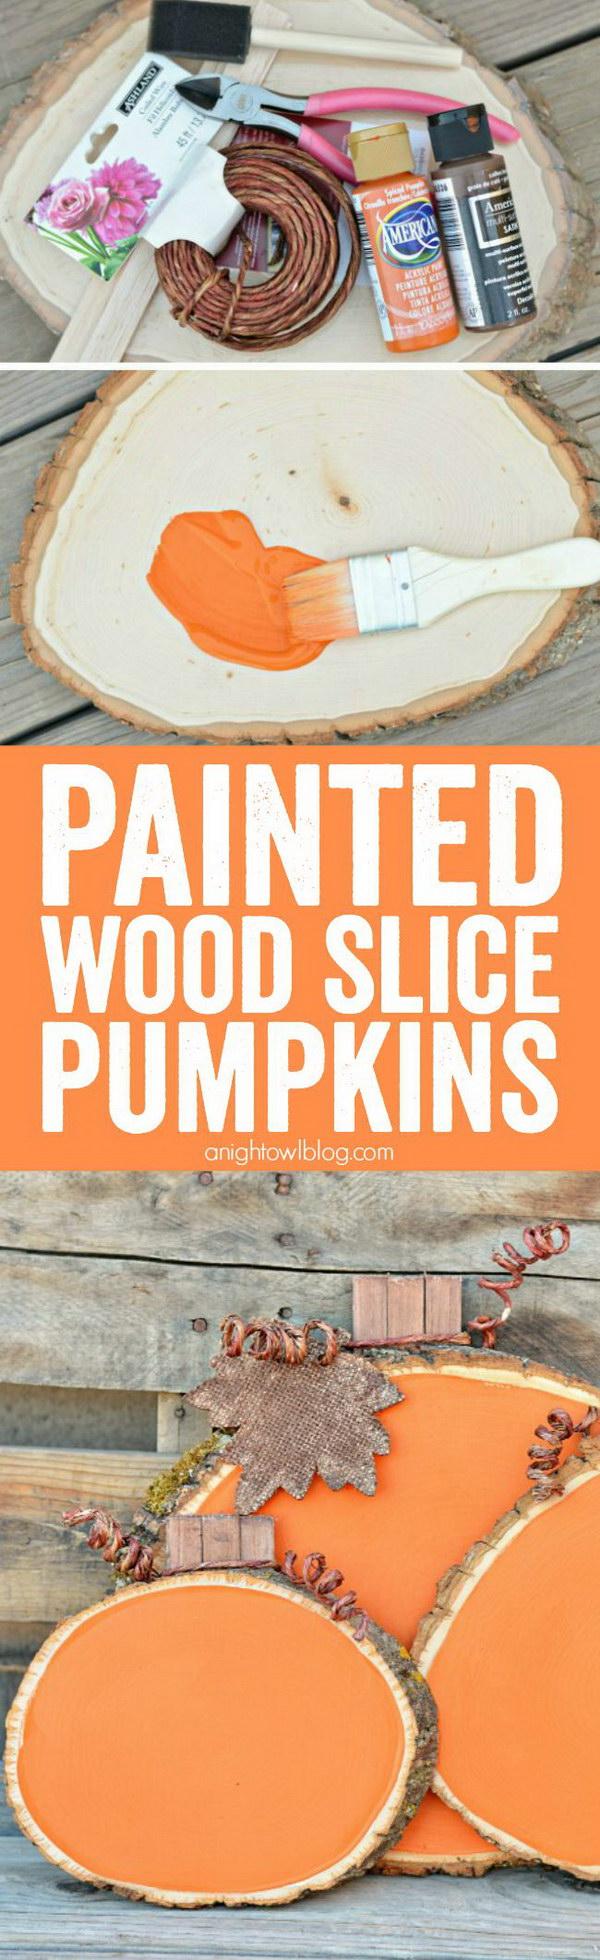 Painted Wood Slice Pumpkins.